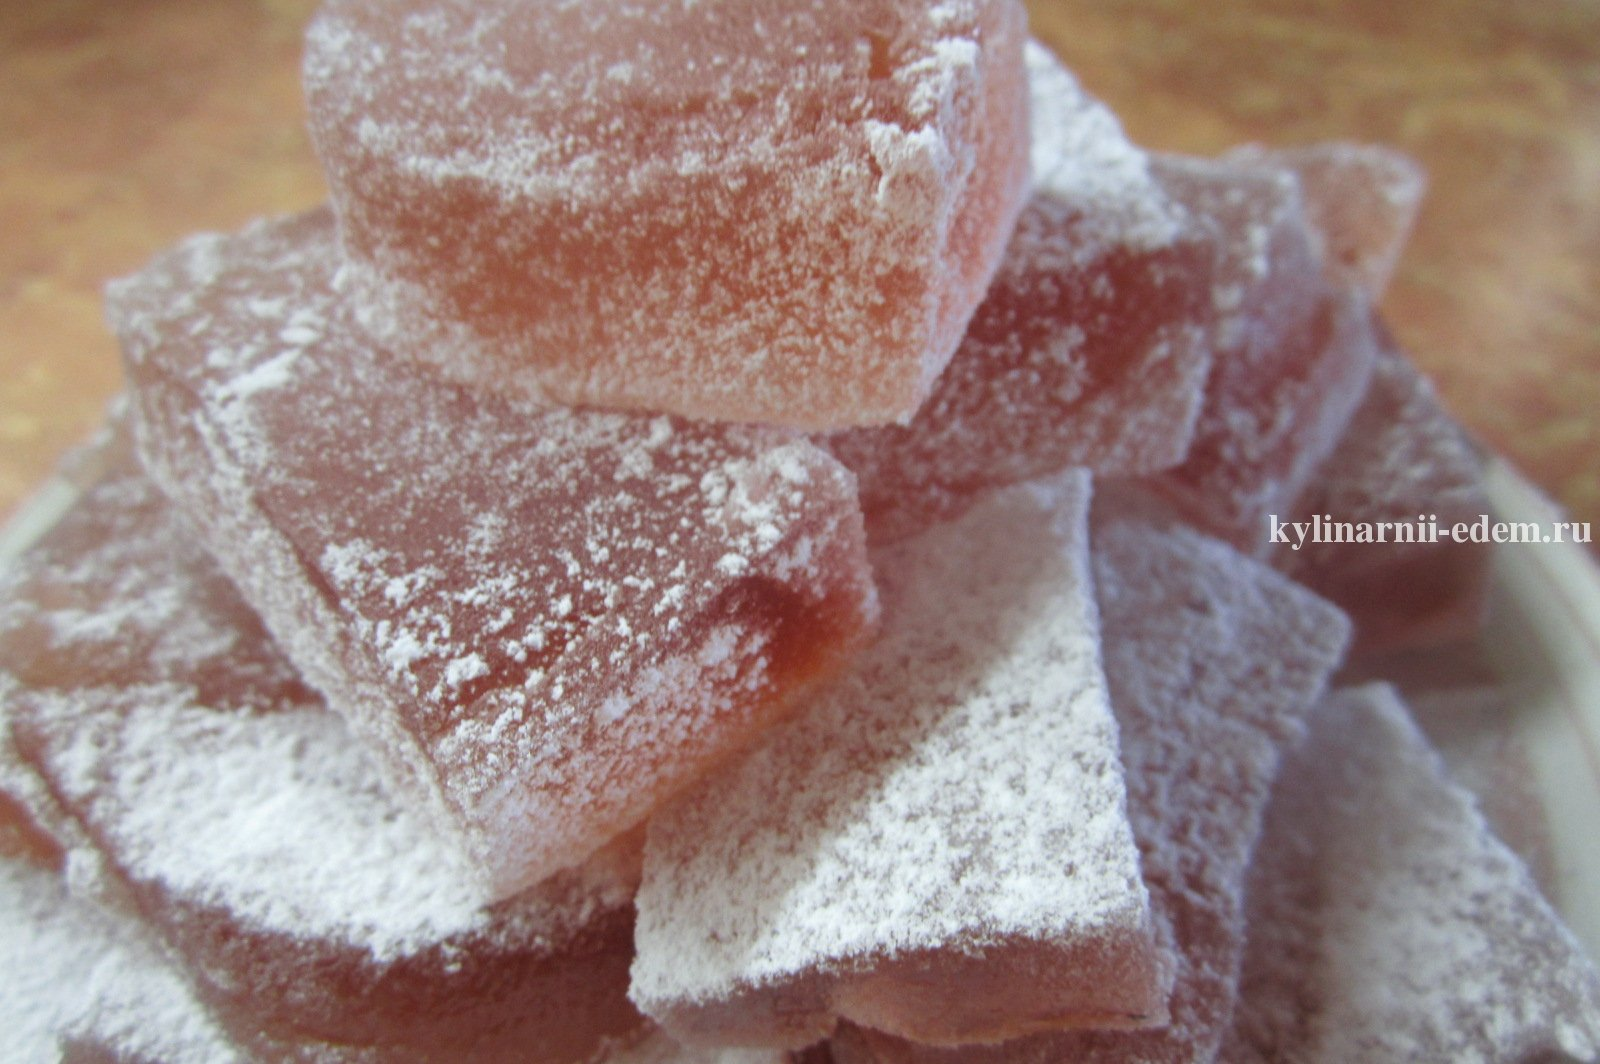 Рецепт мармелада в домашних условиях пошагово